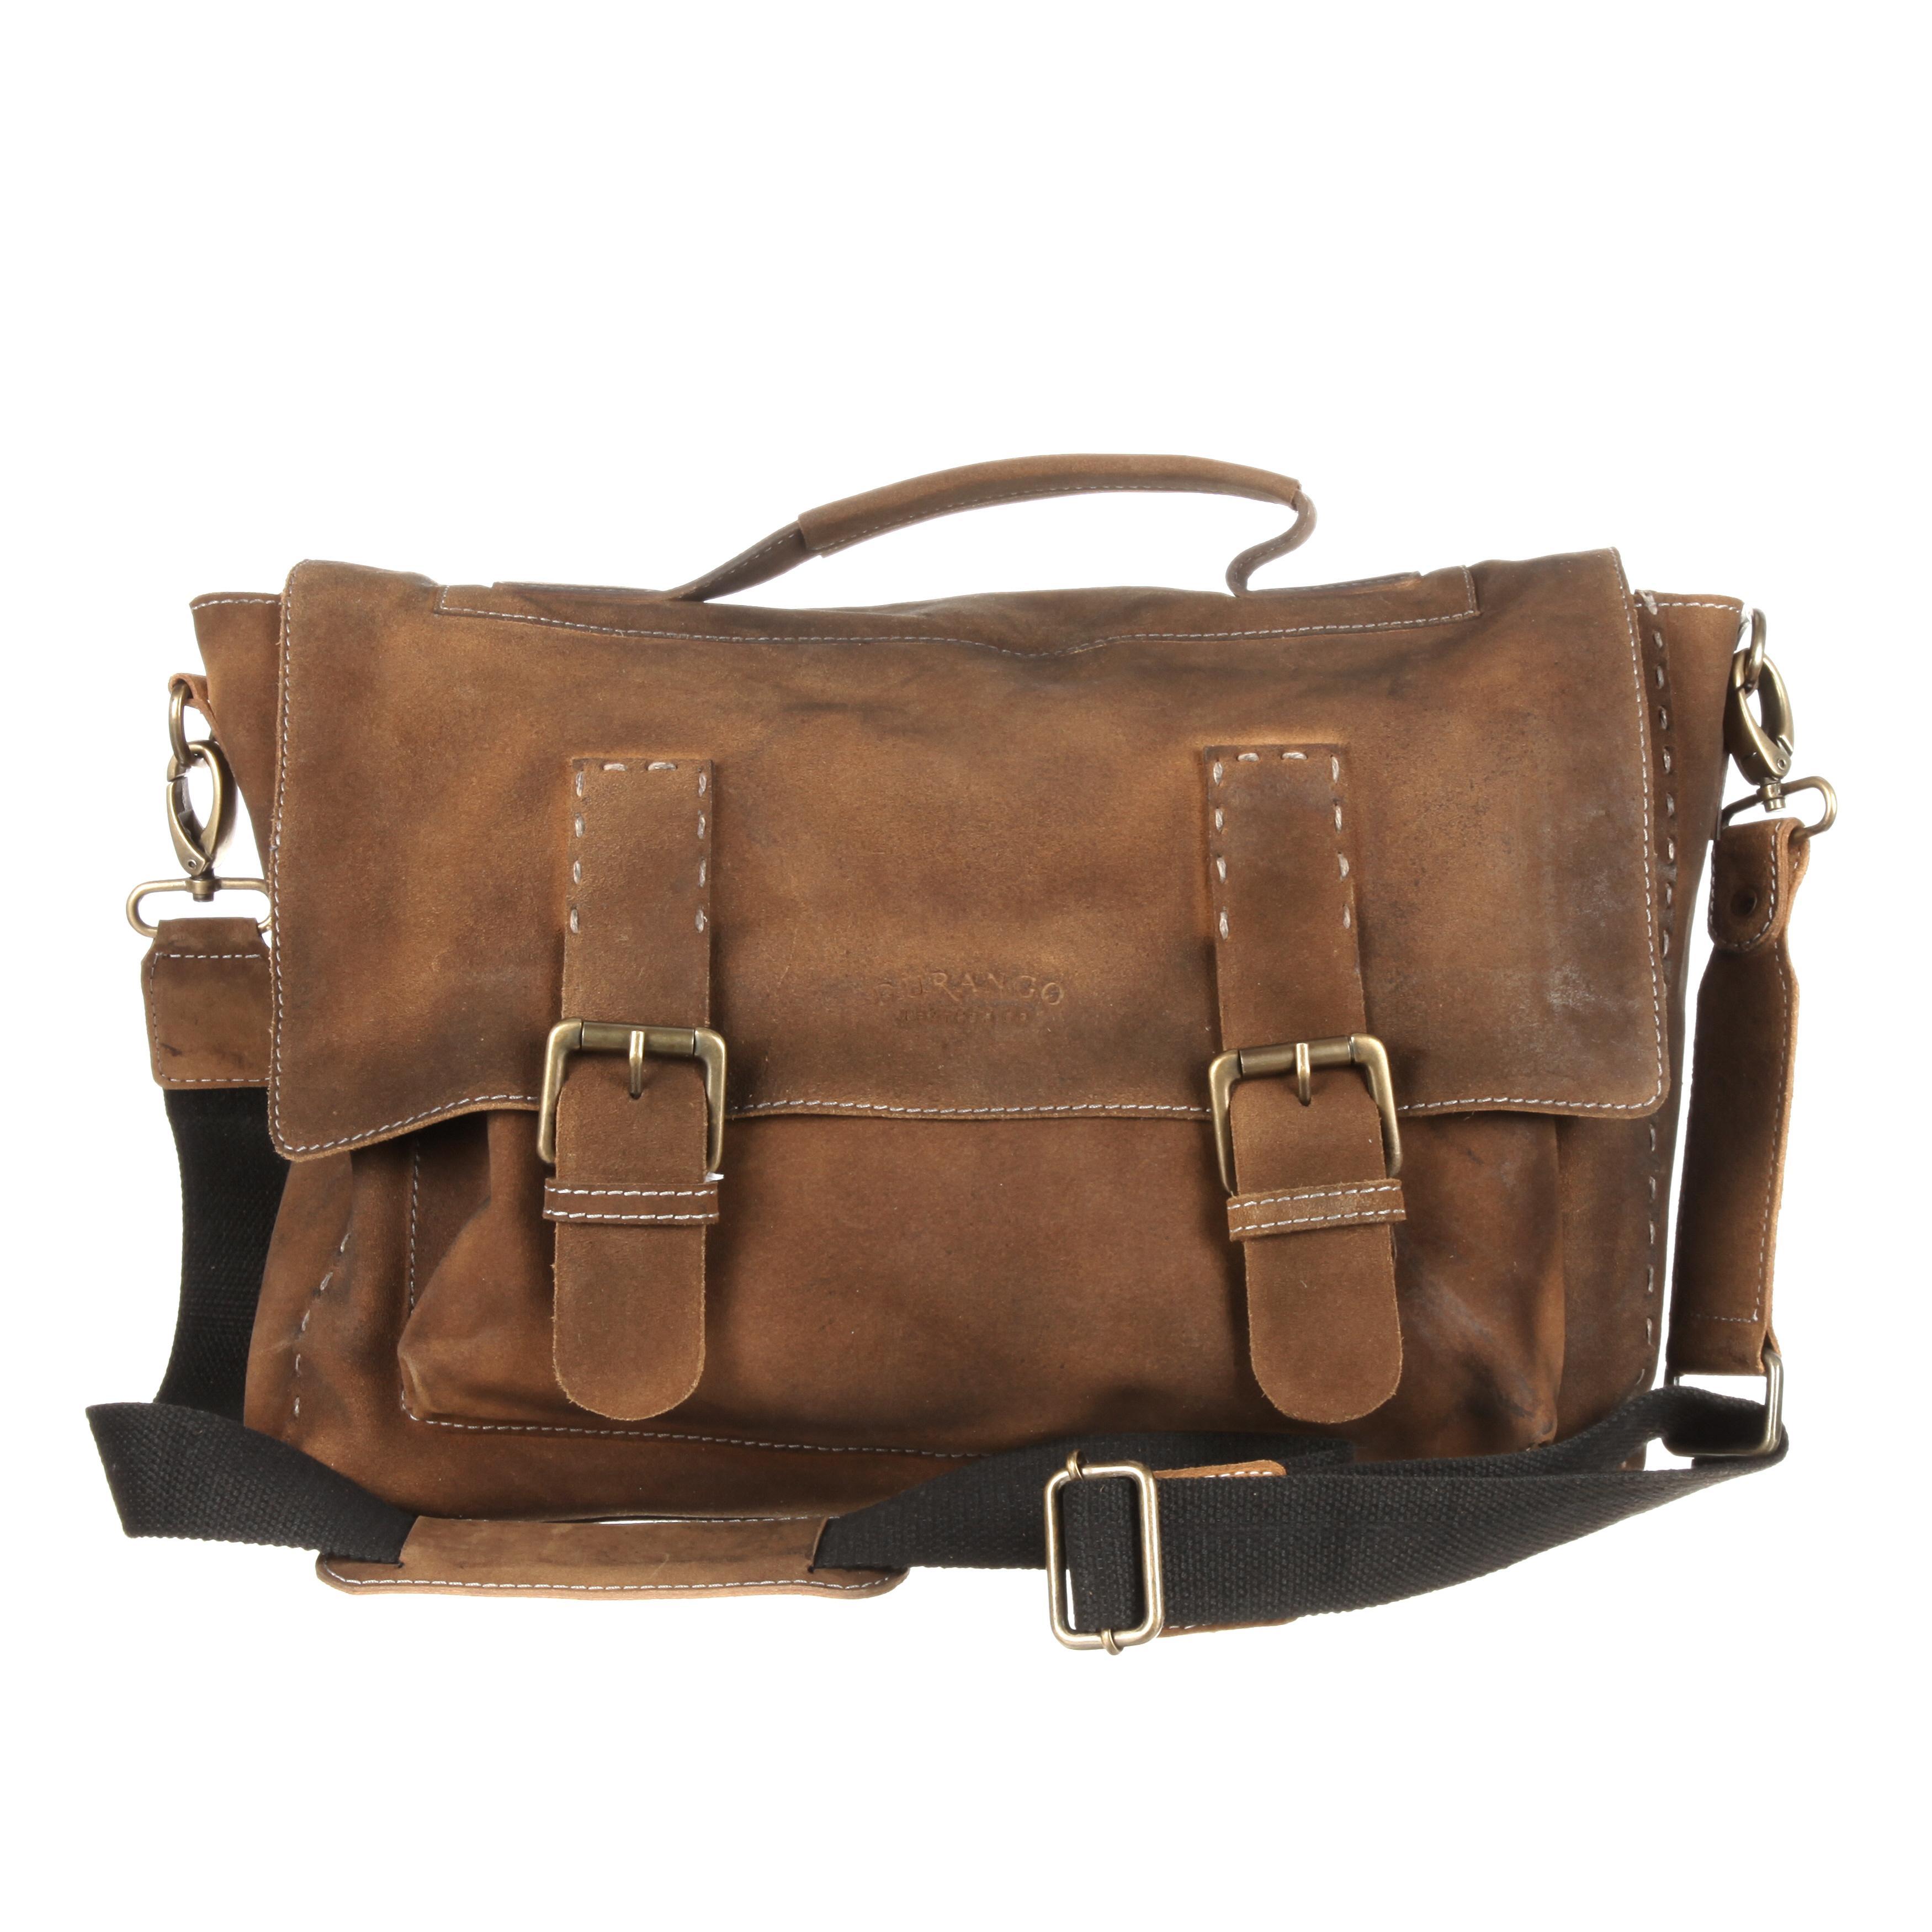 Durango Leather Company Outlaw Messenger Bag, DLC0065